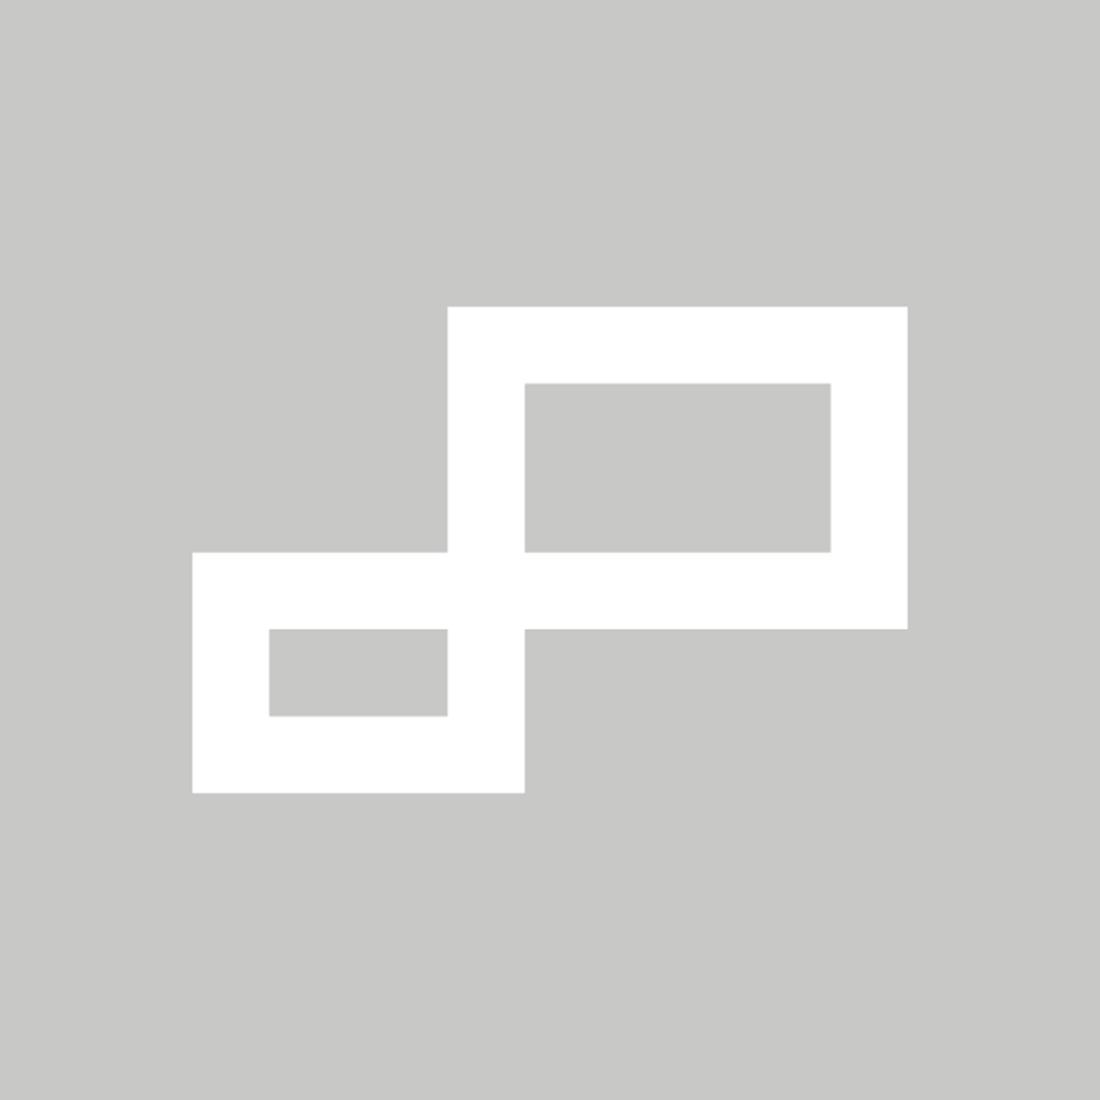 Epson TM-C3500 Color Name Tag Printer